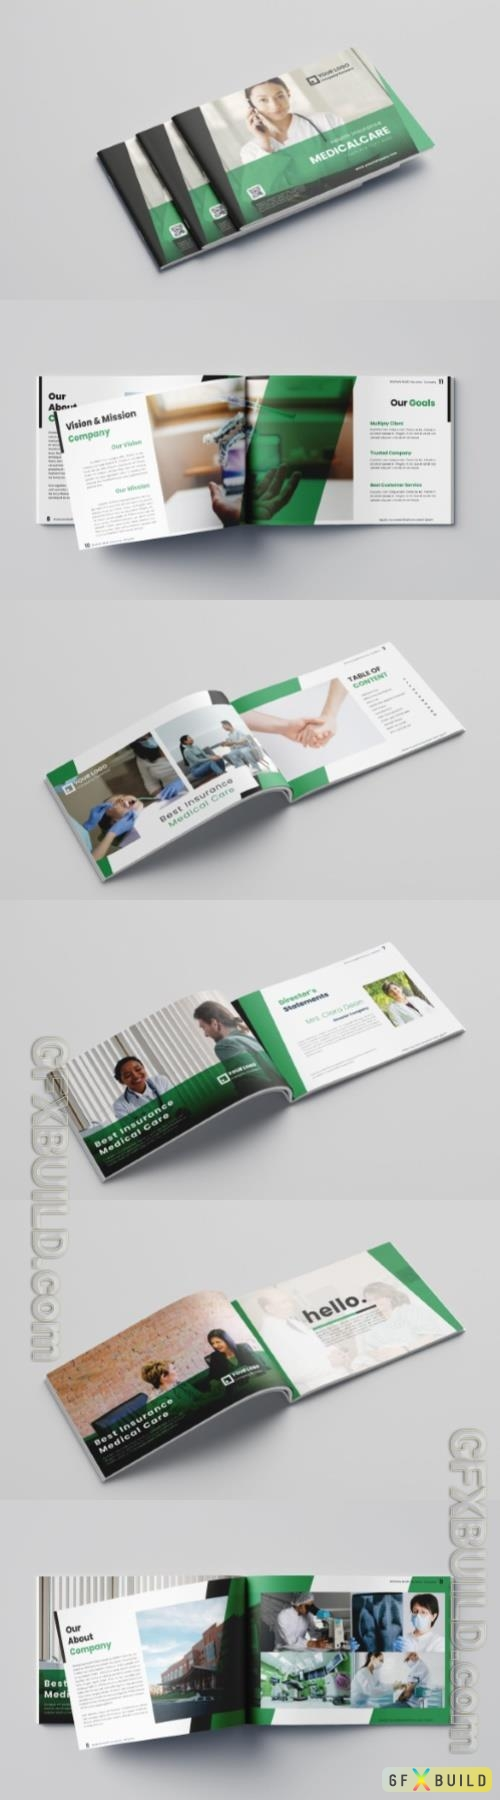 Health Insurance Brochure Vol.1